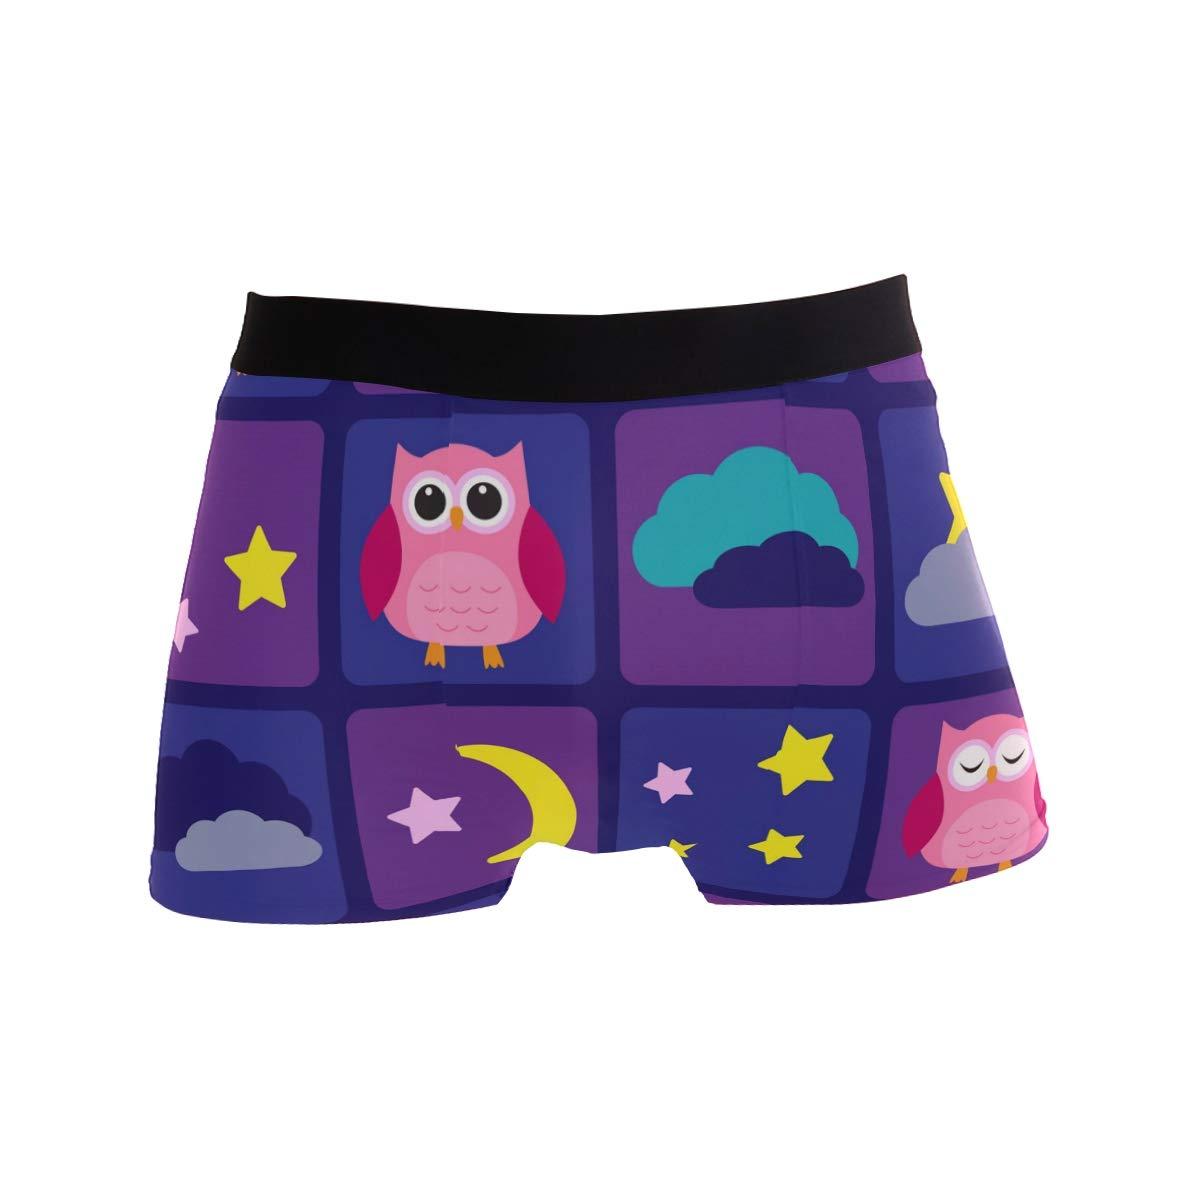 WIHVE Mens Boxer Briefs Cartoon Owls Night Sky Moon Stars Underwear Regular Leg No Ride Up Trunks